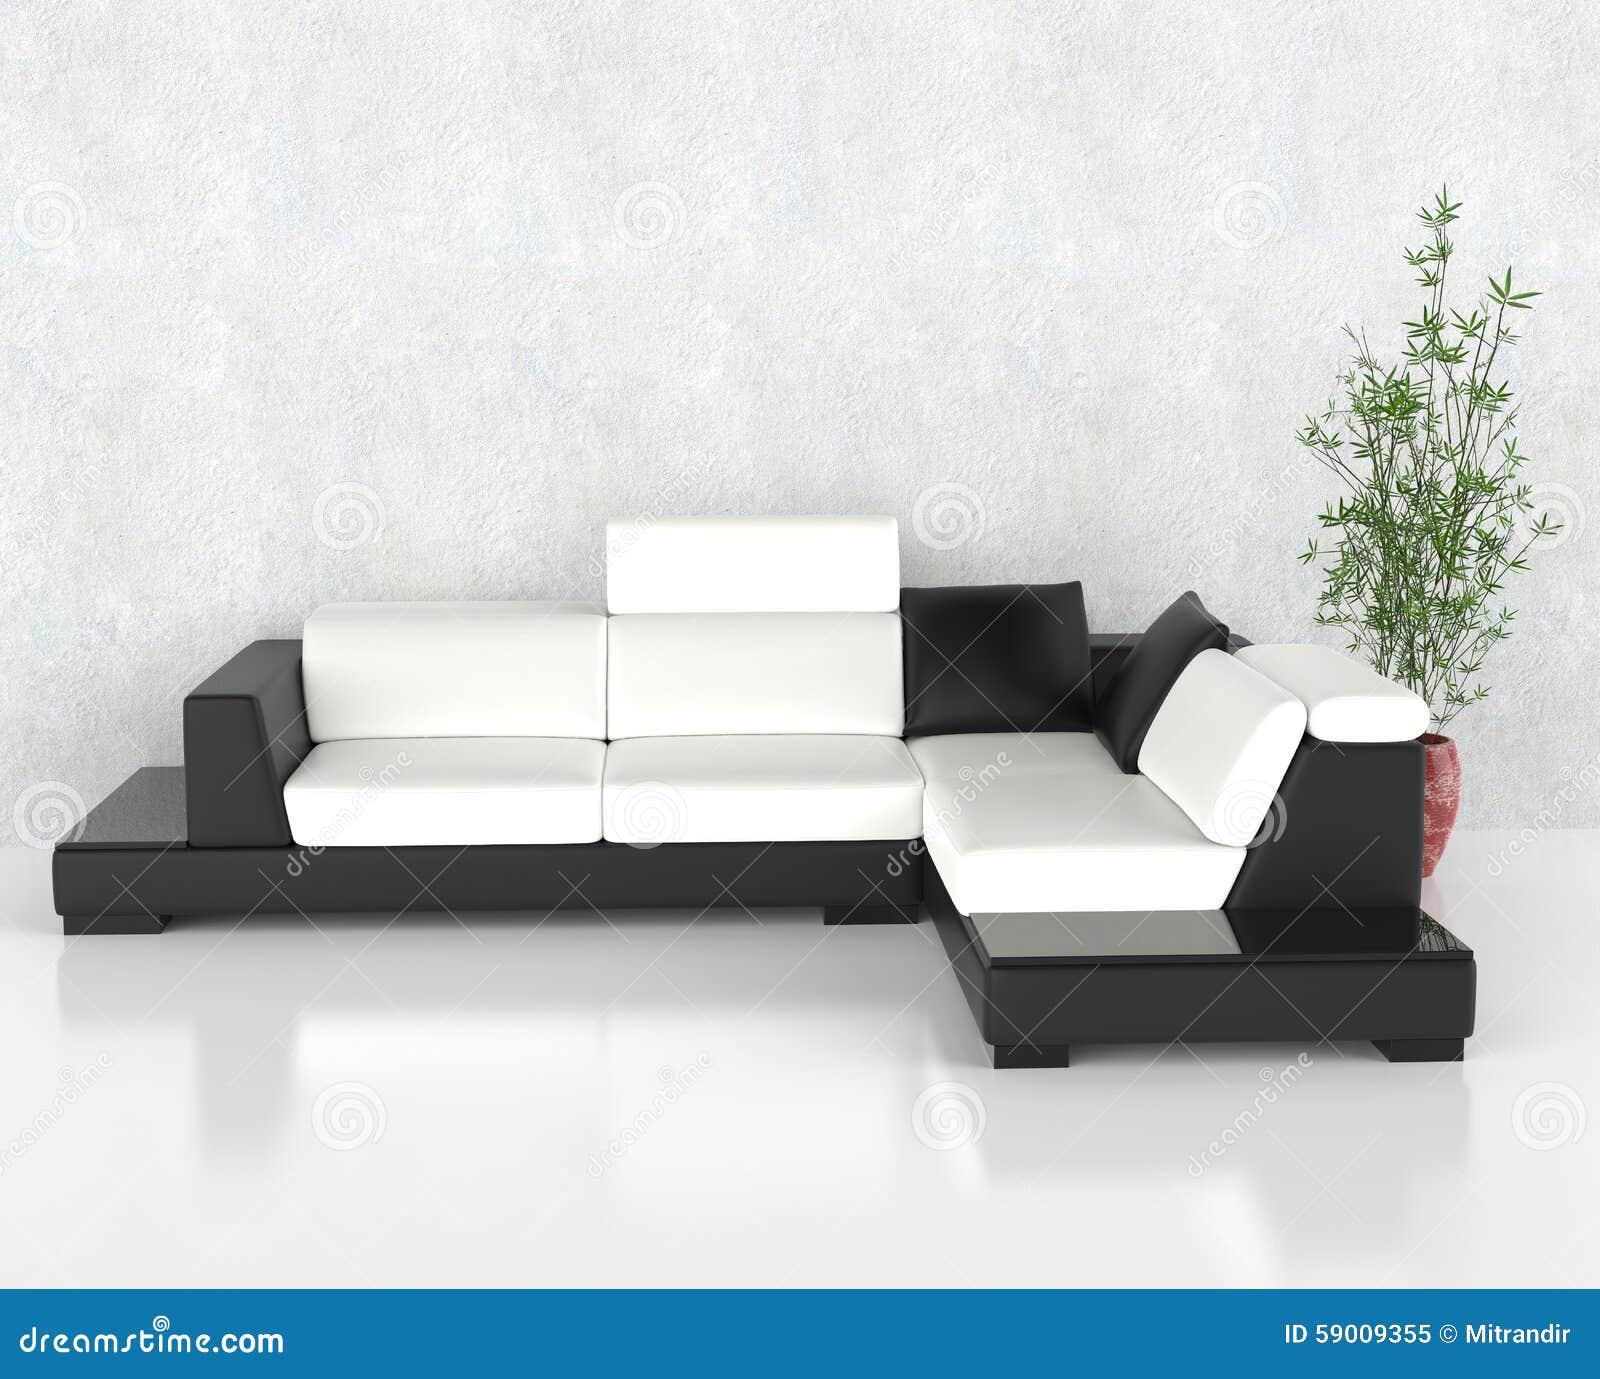 Zwart-witte Moderne Woonkamer Stock Foto - Afbeelding: 59009355